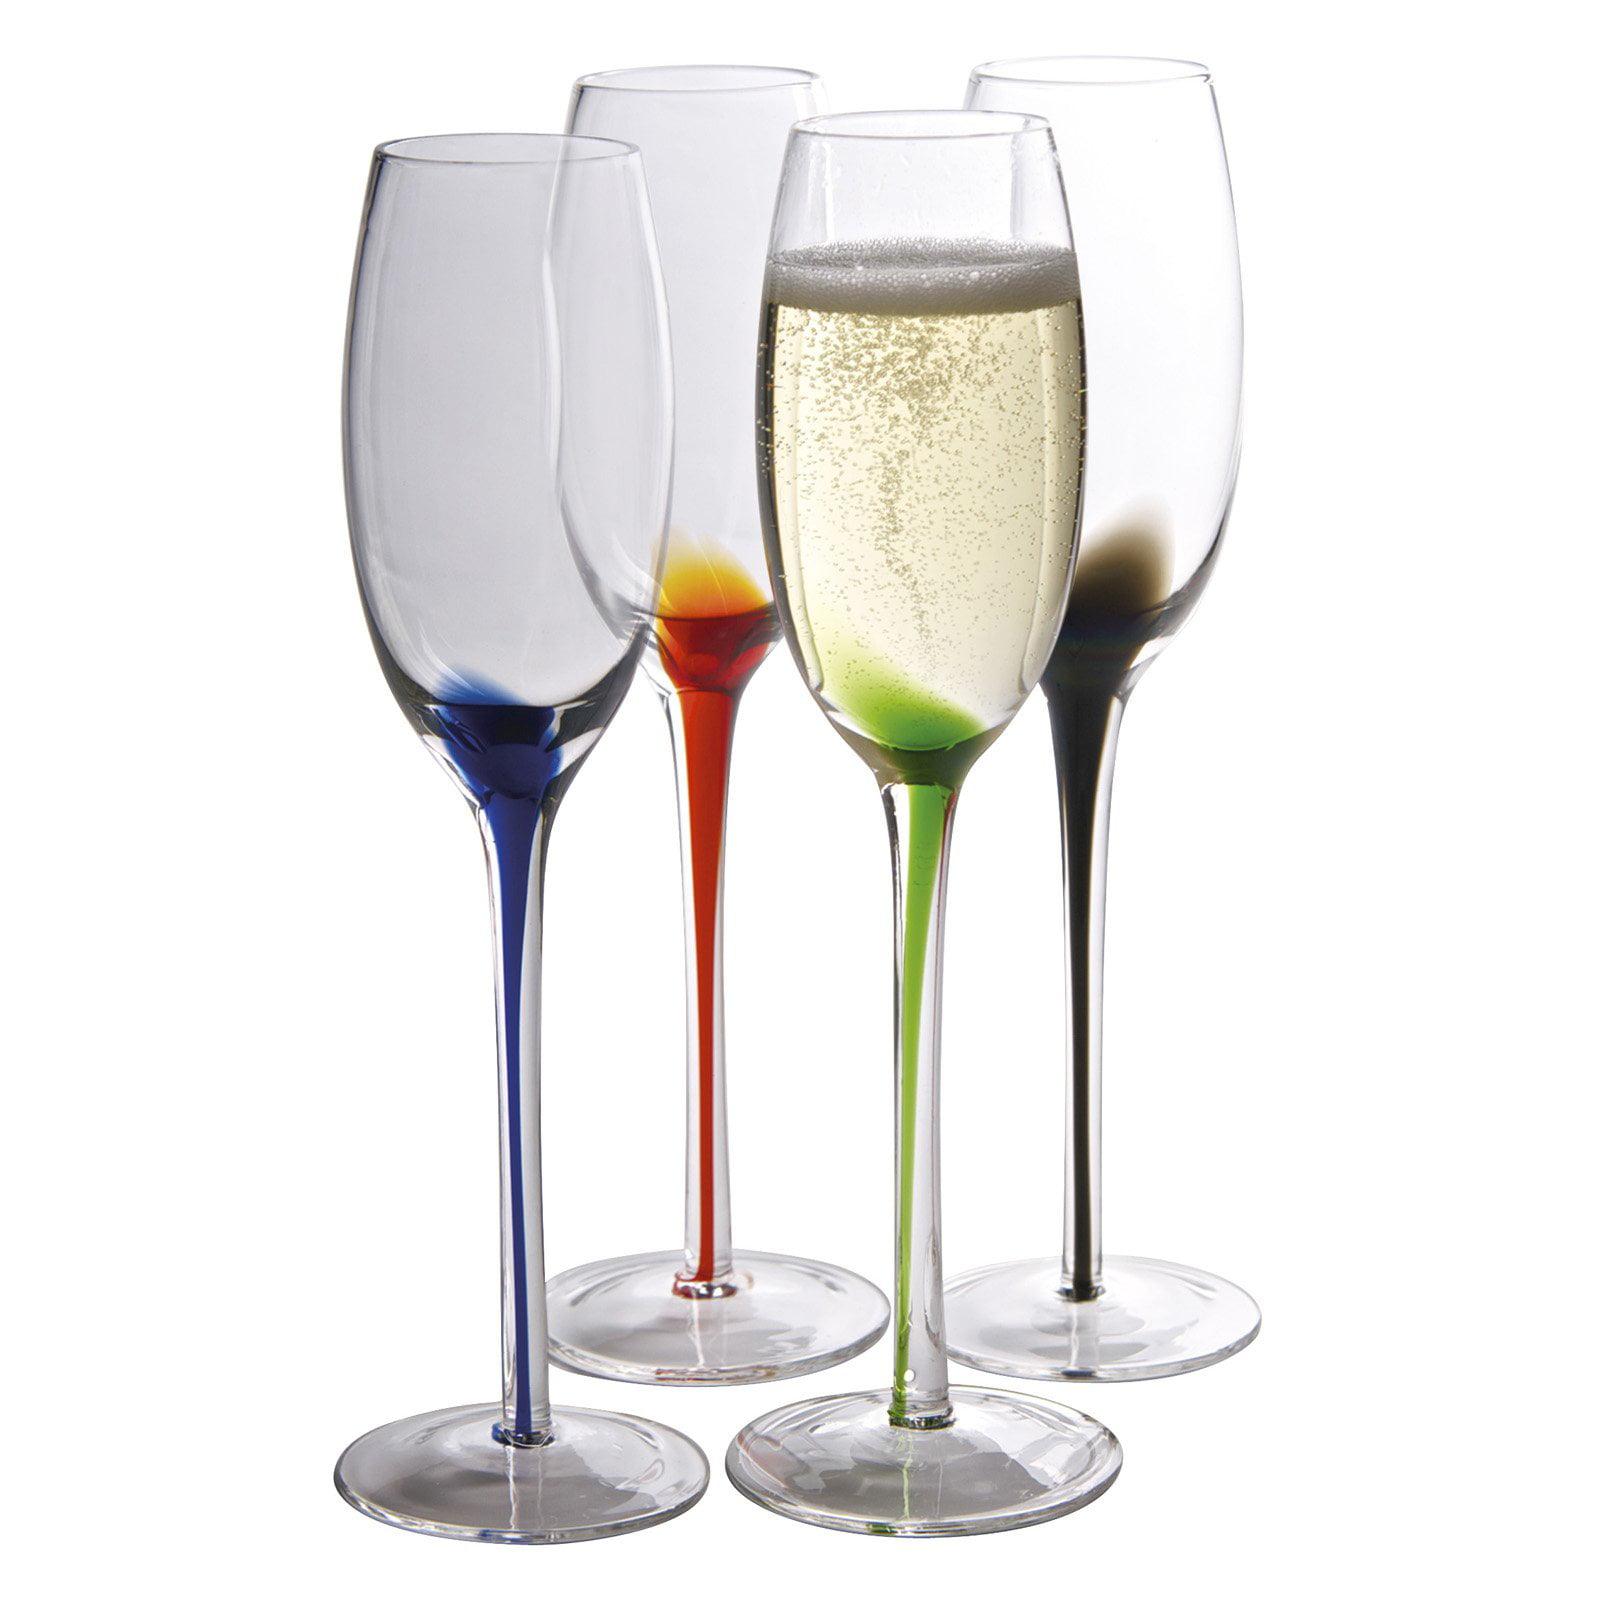 Artland Splash Champagne Flute - Set of 4